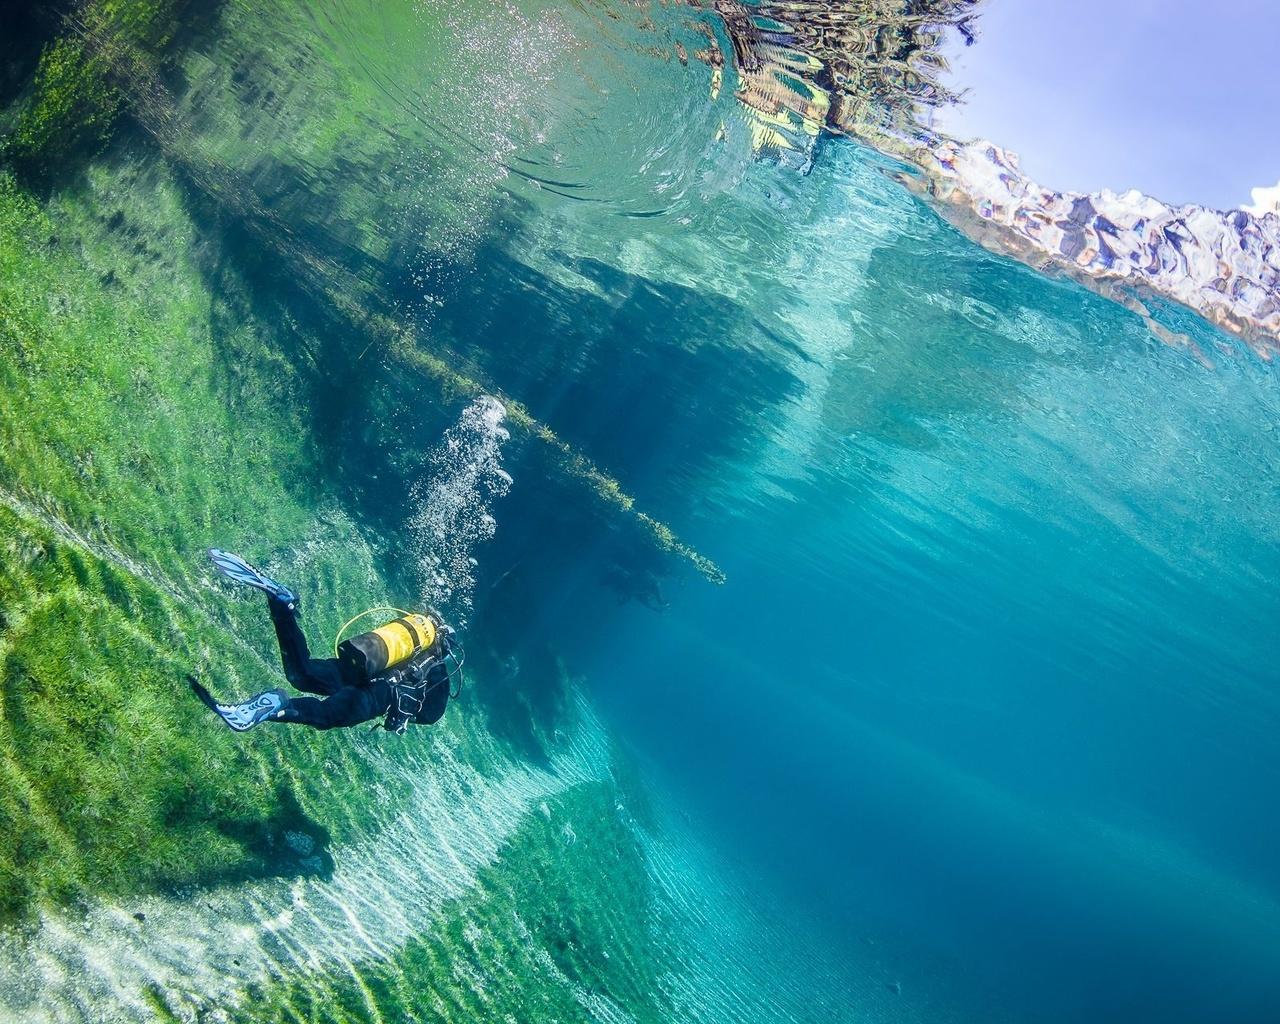 водолаз, дайвинг, фото, под водой, красиво, супер фото